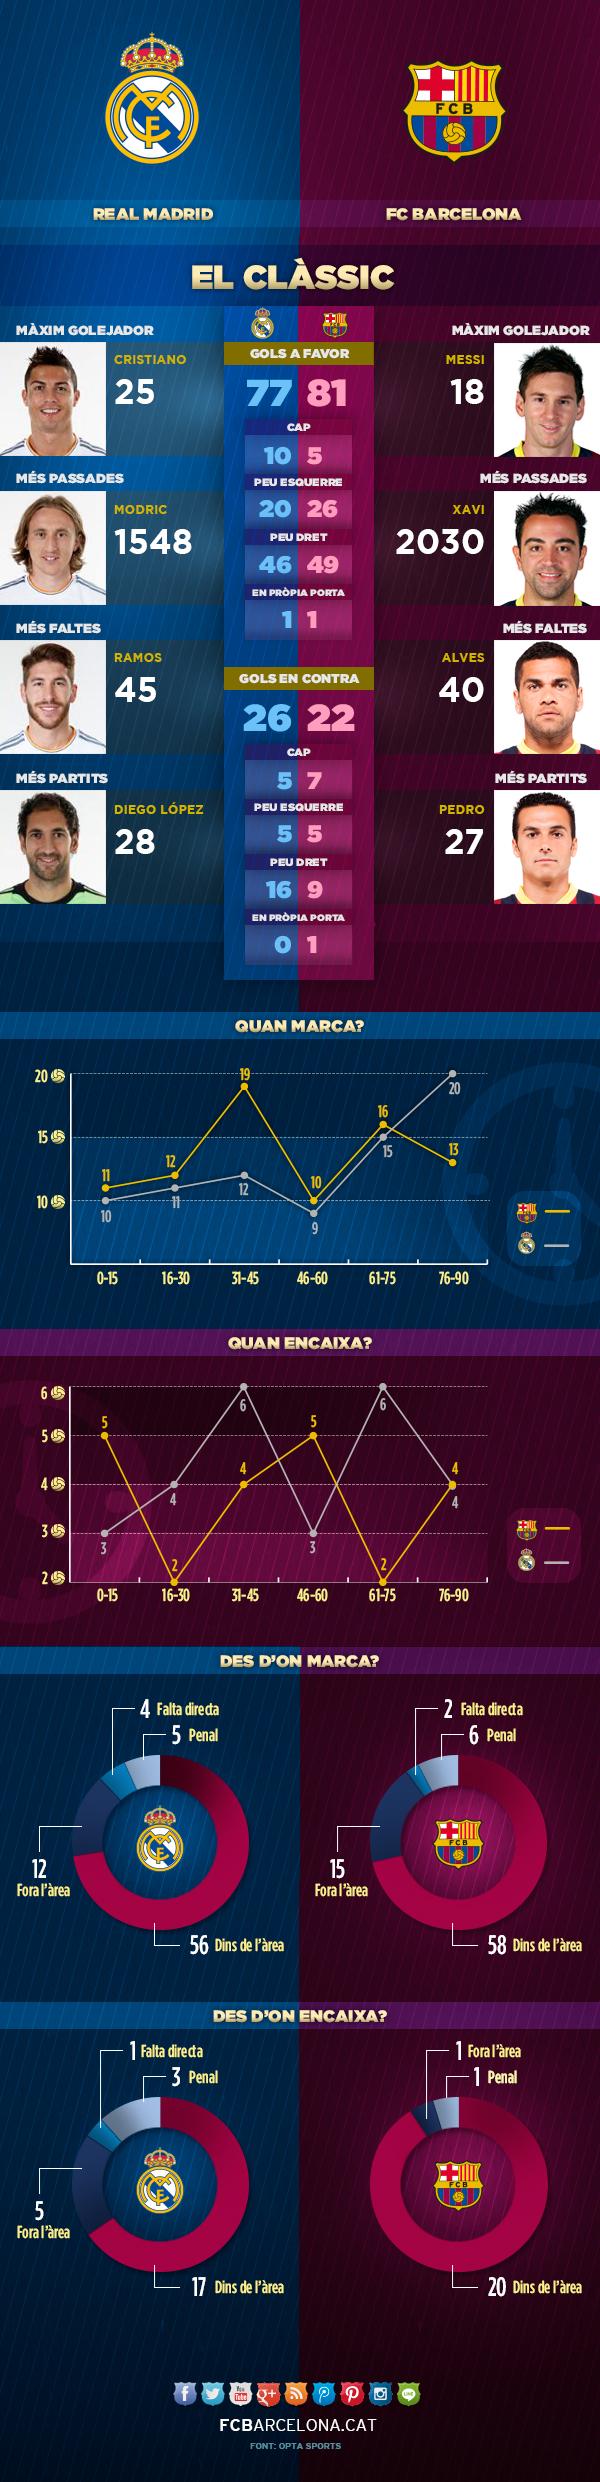 L'infogràfic del Clàssic